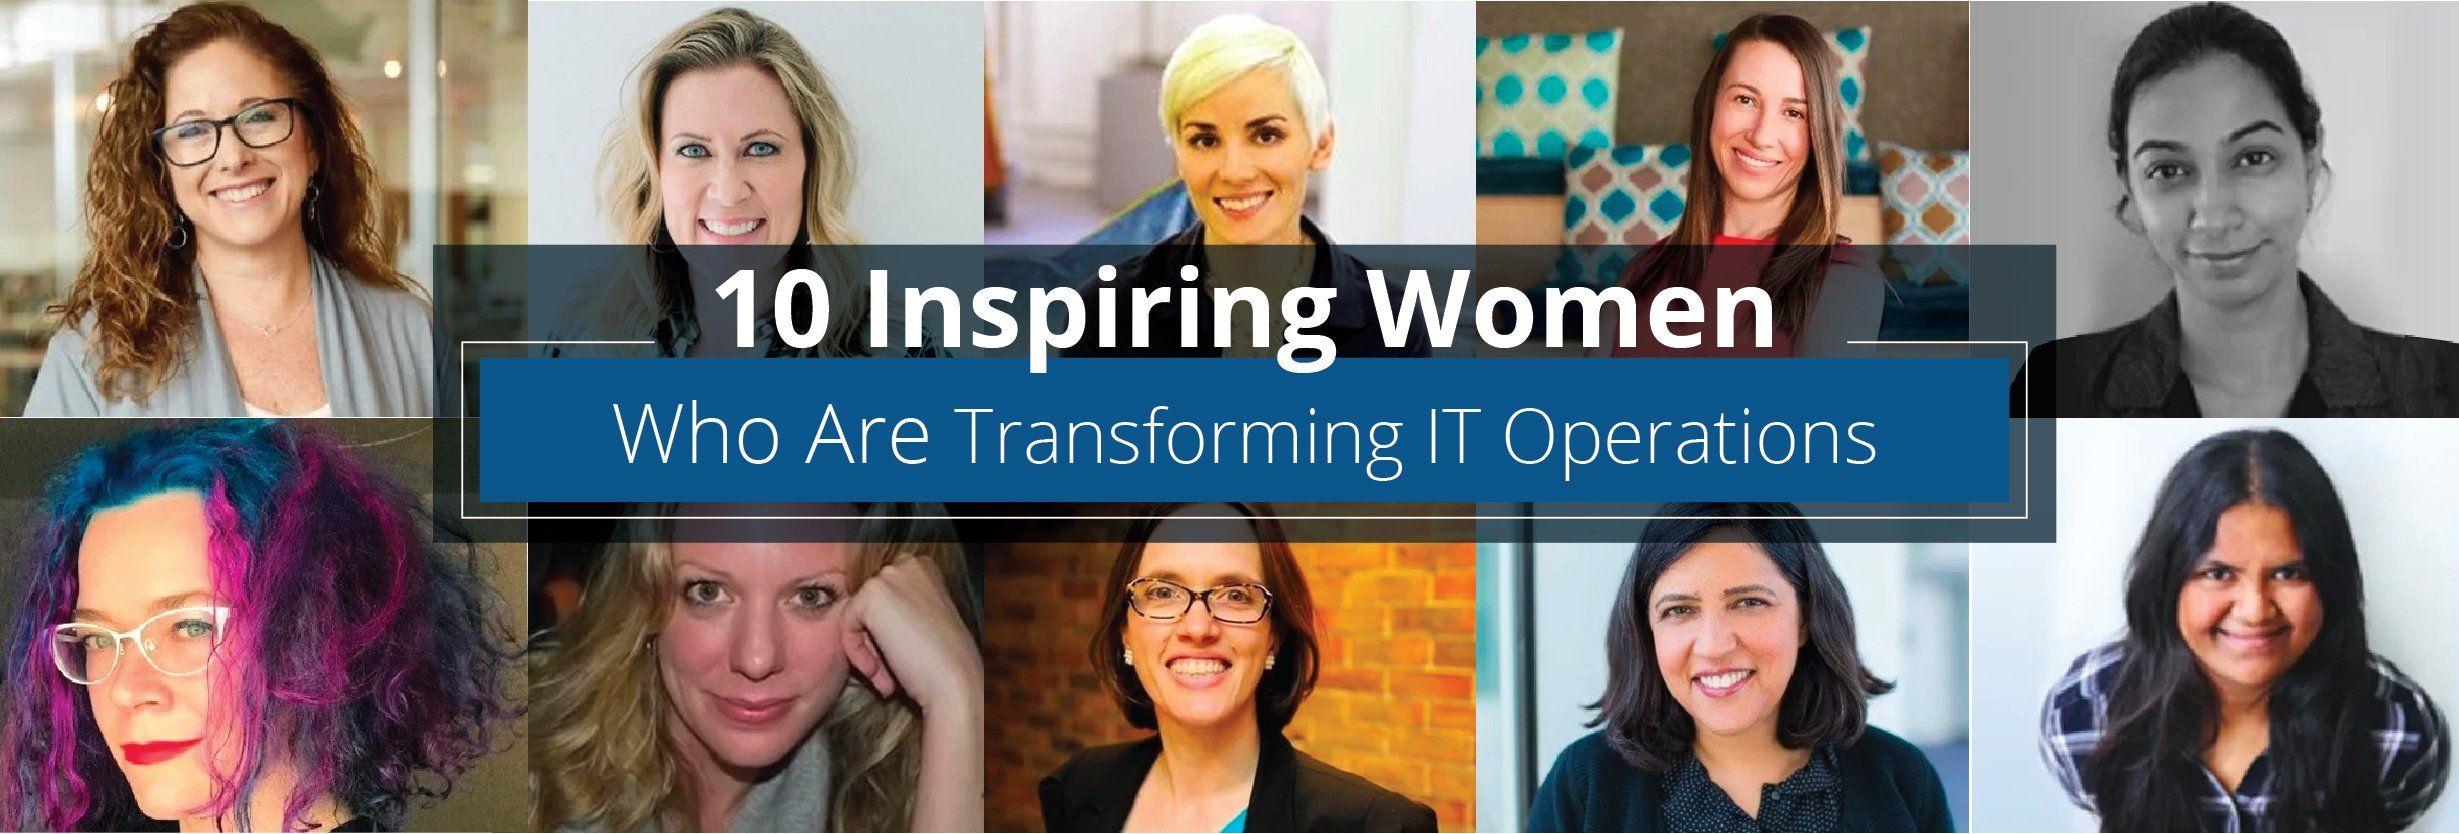 IT Ops / DevOps / SREの世界をより良い方向に変革している10人の刺激的な女性